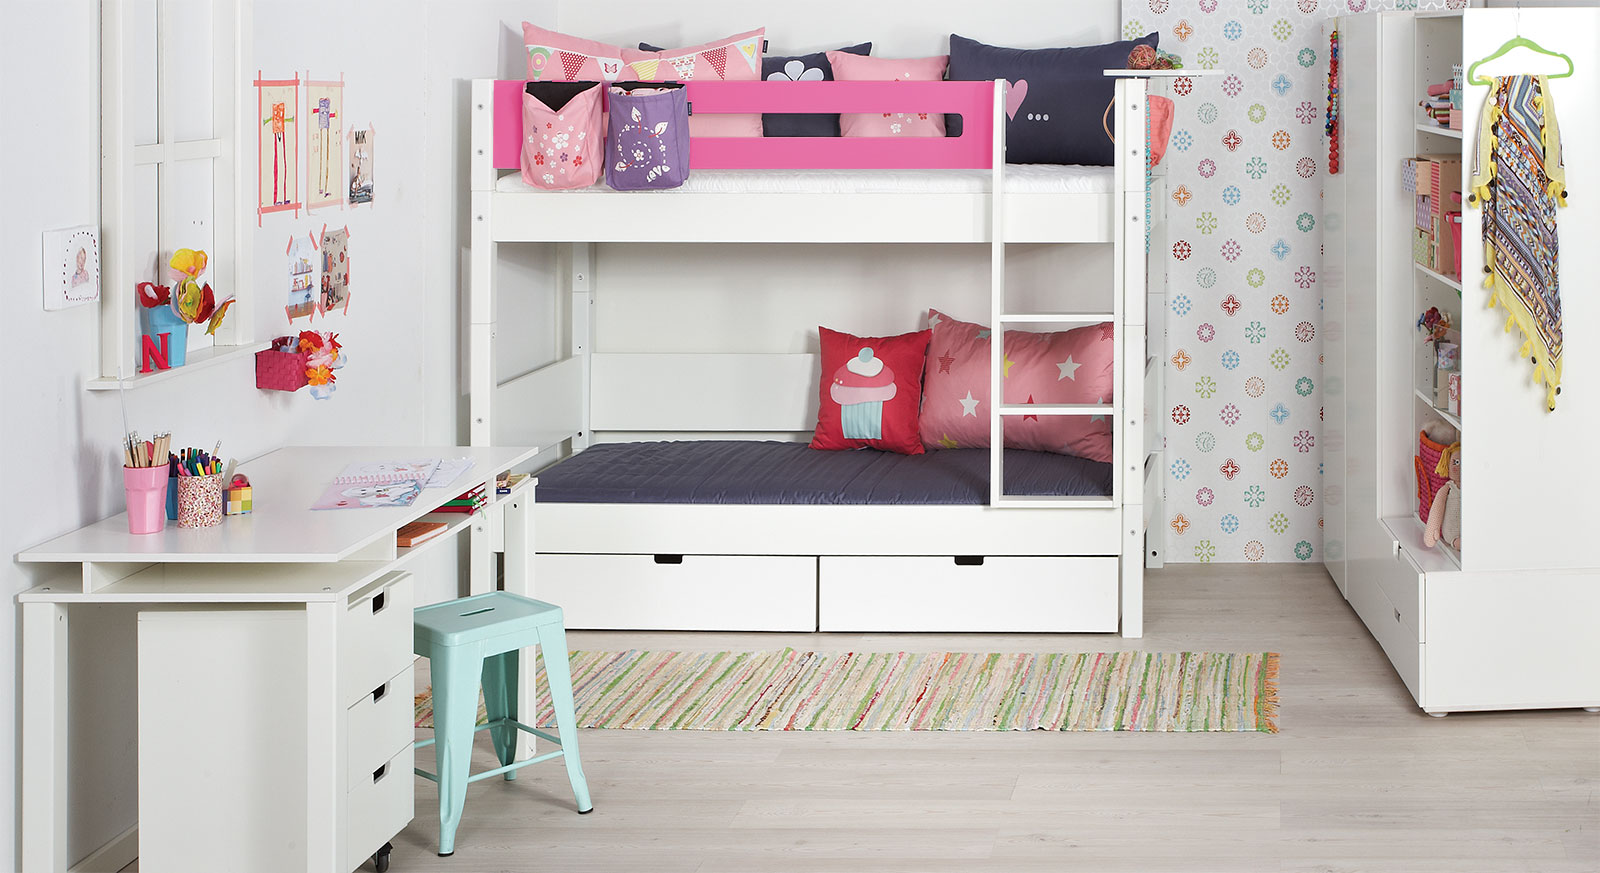 etagen bett affordable etagenbett parisot tam tam wei und. Black Bedroom Furniture Sets. Home Design Ideas